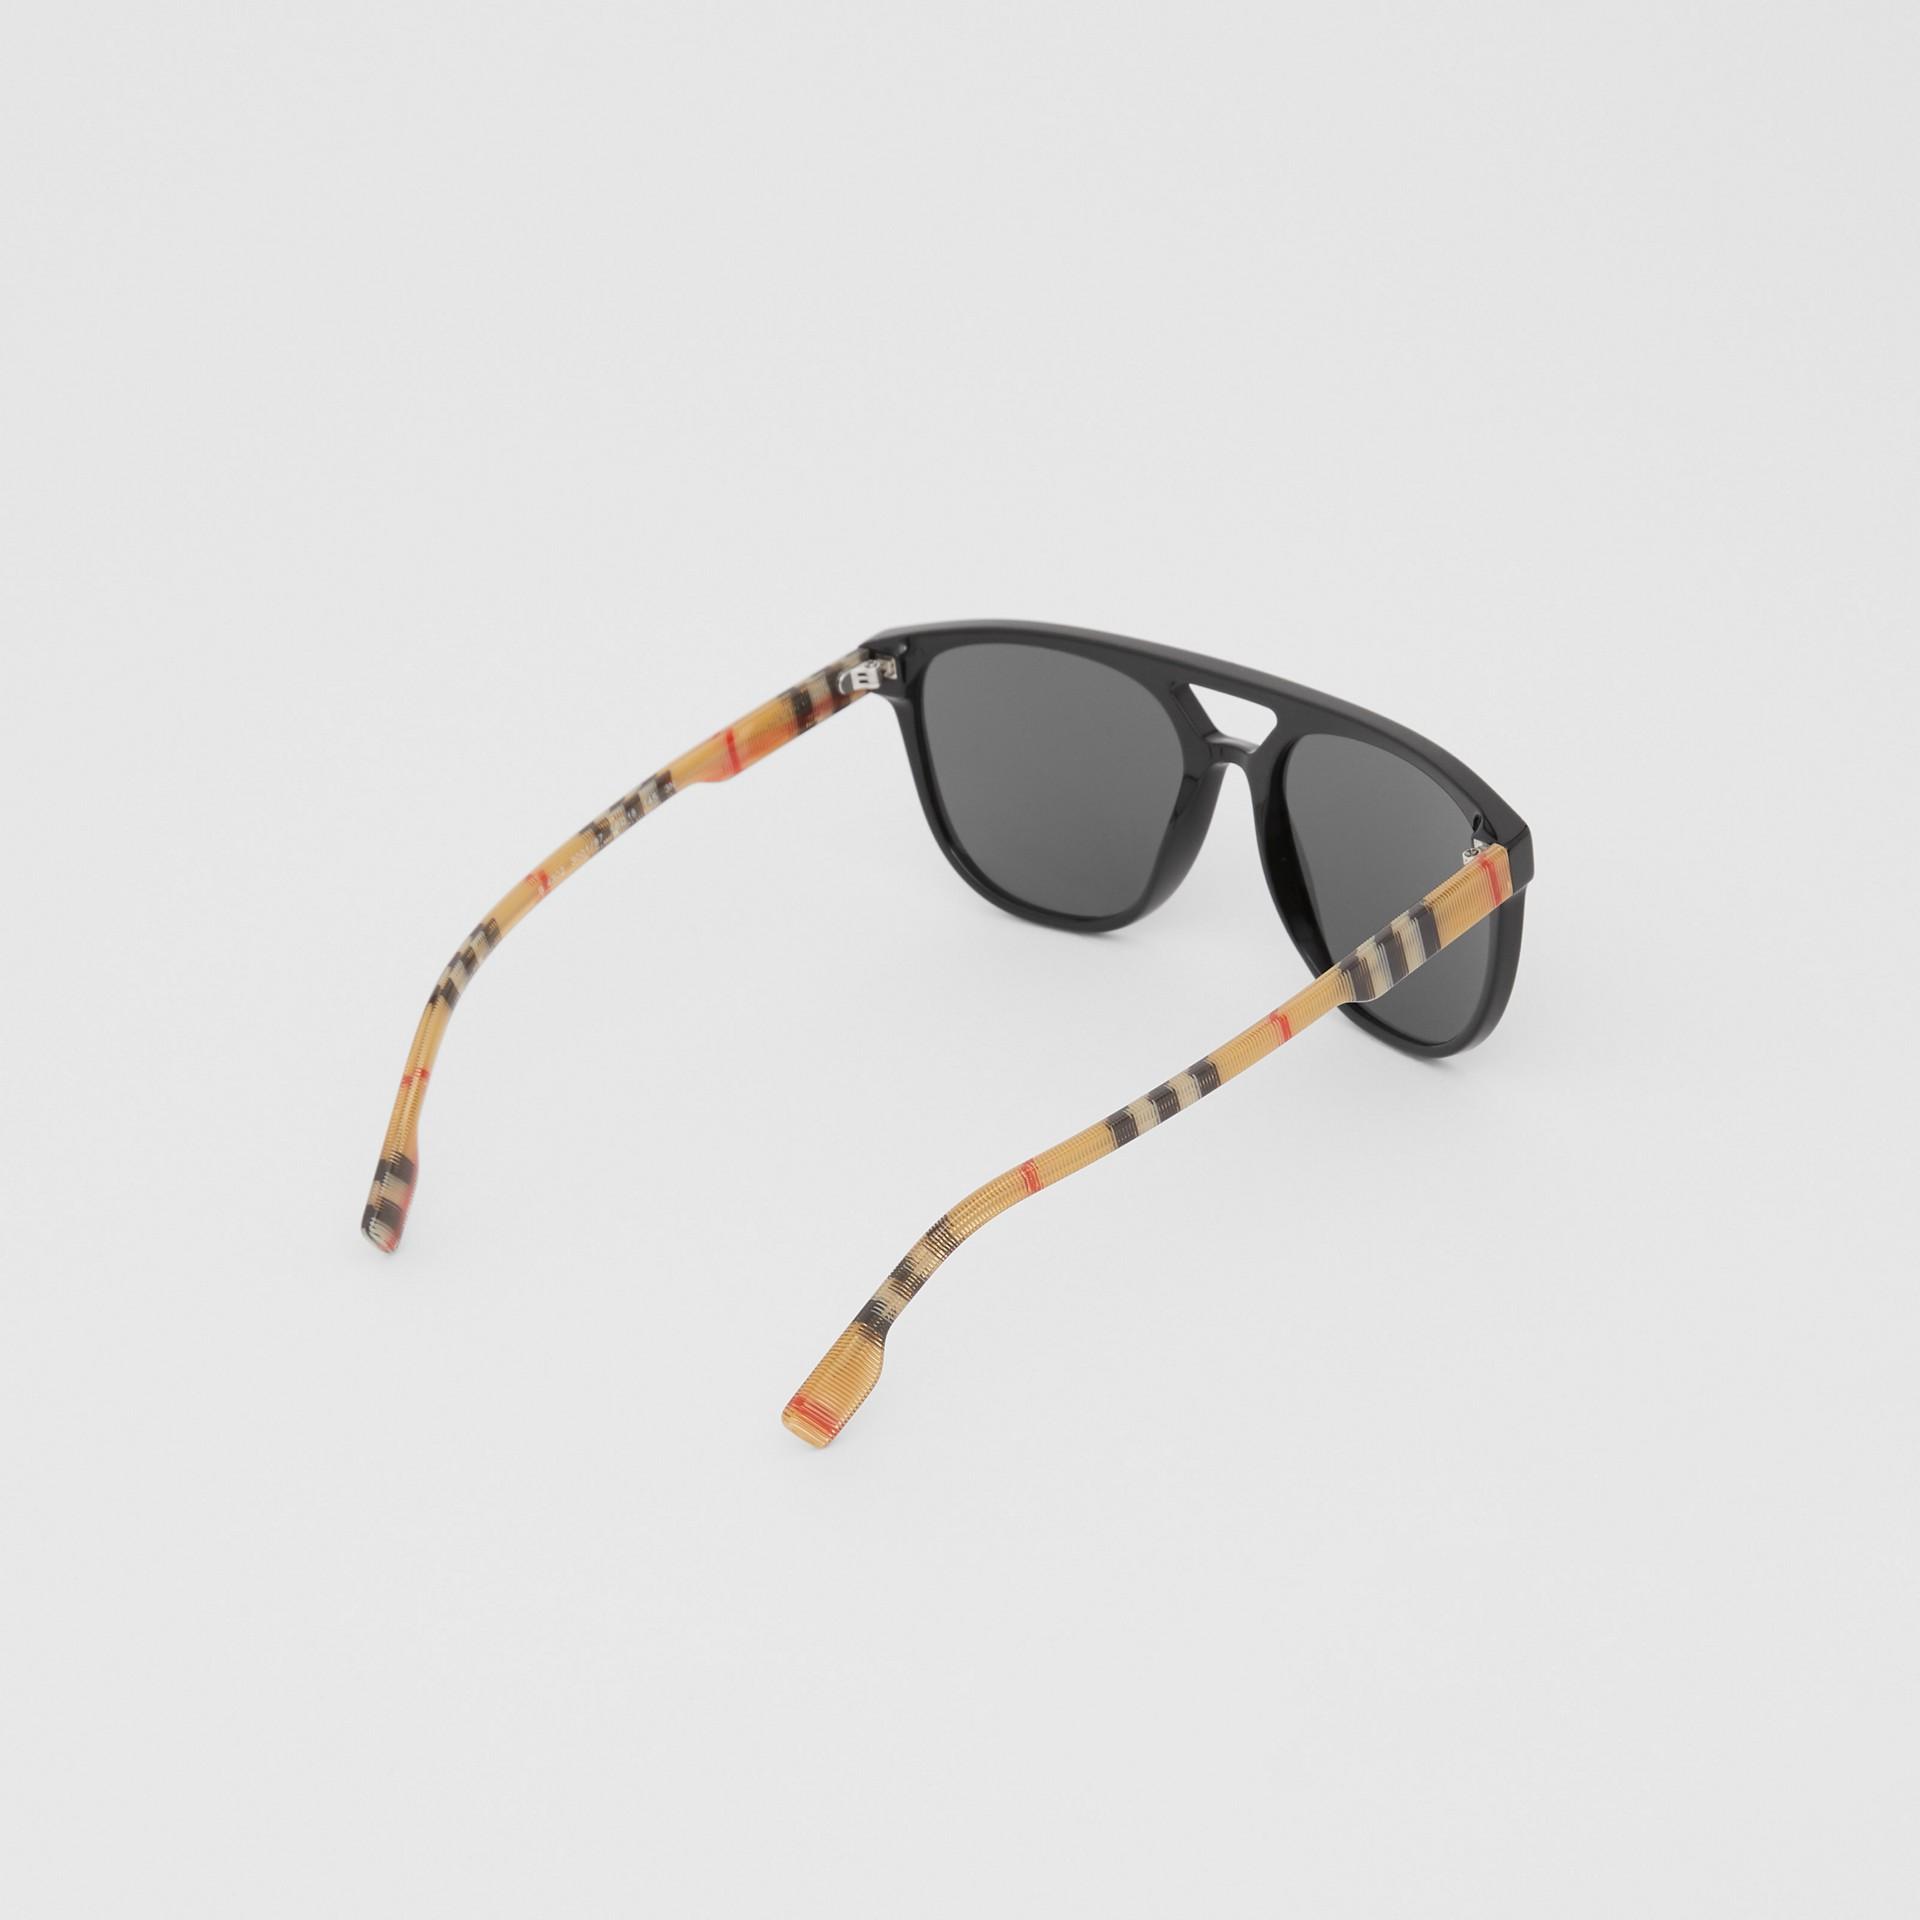 Navigator sunglasses in Black | Burberry - gallery image 4